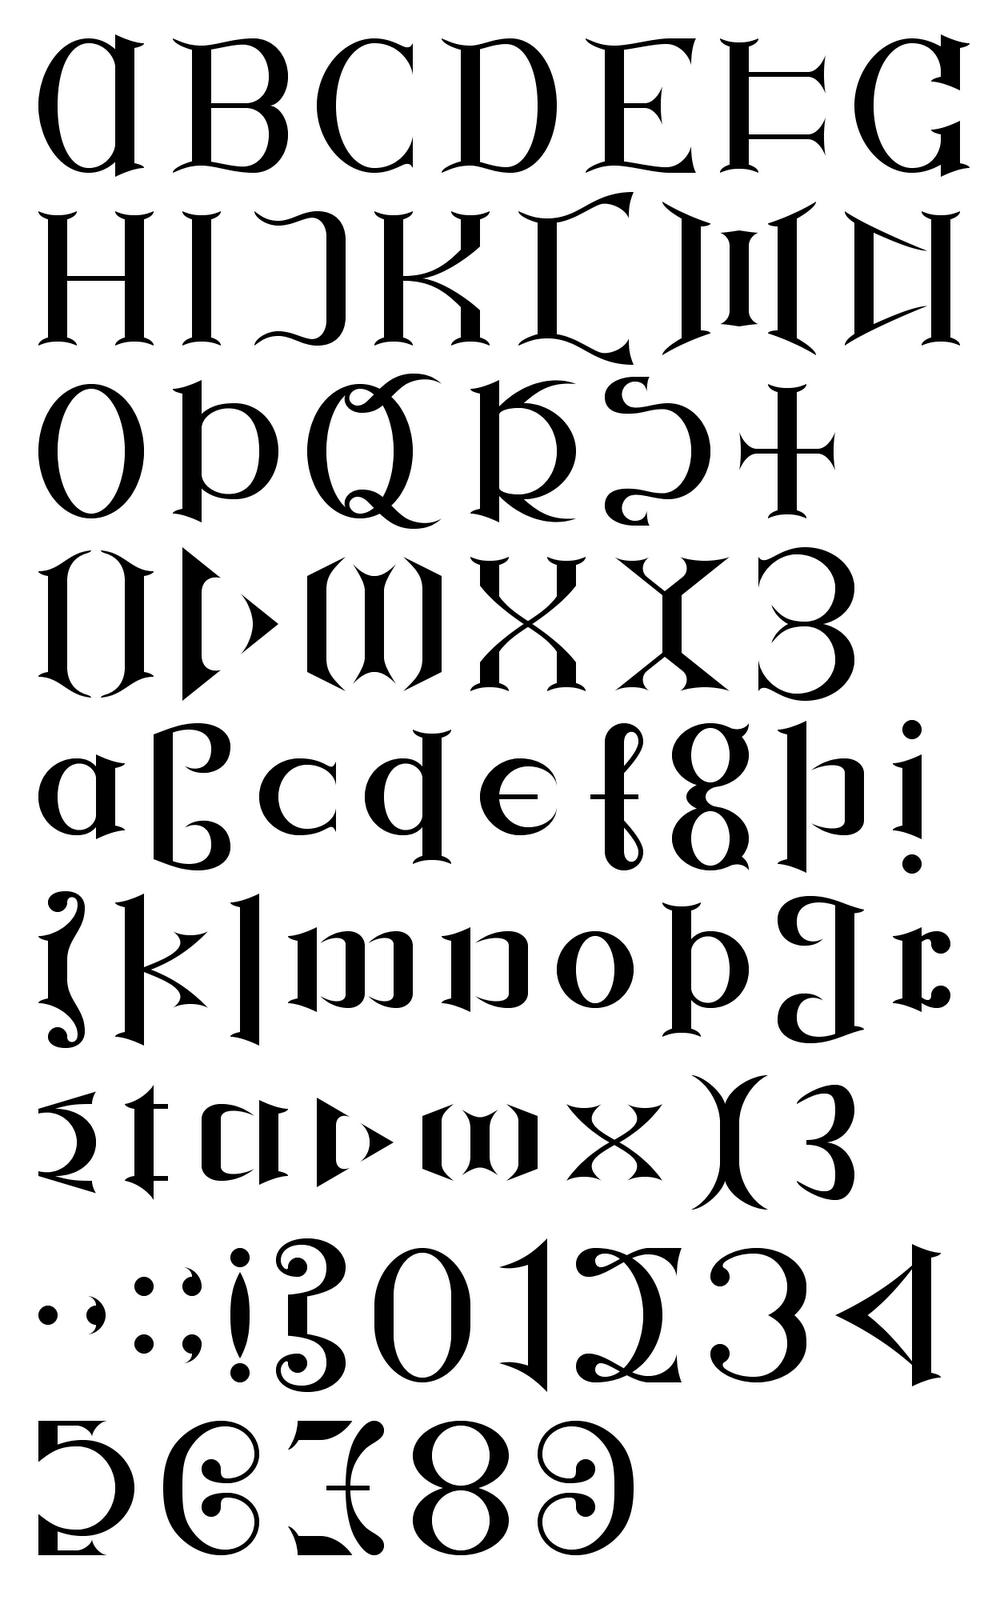 Ambigram Font | Ambigramme | Pinterest - Ambigram Generator Free Printable